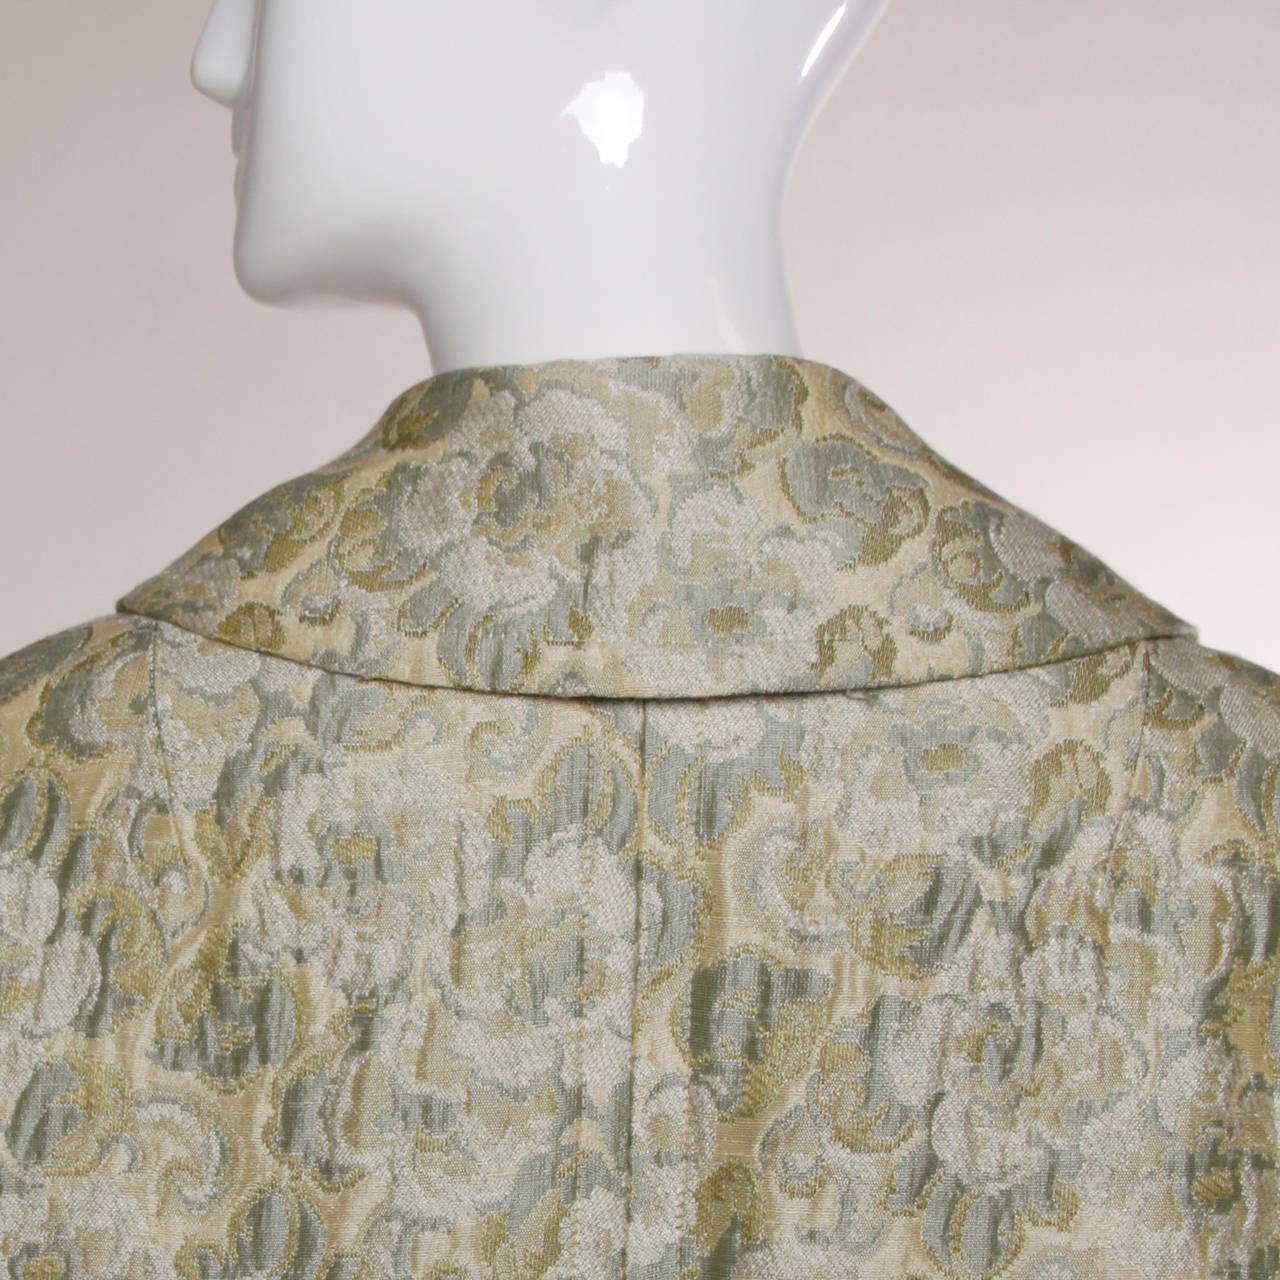 Joseph Magnin 1960s Vintage Metallic Brocade Tapestry Trench Coat 8